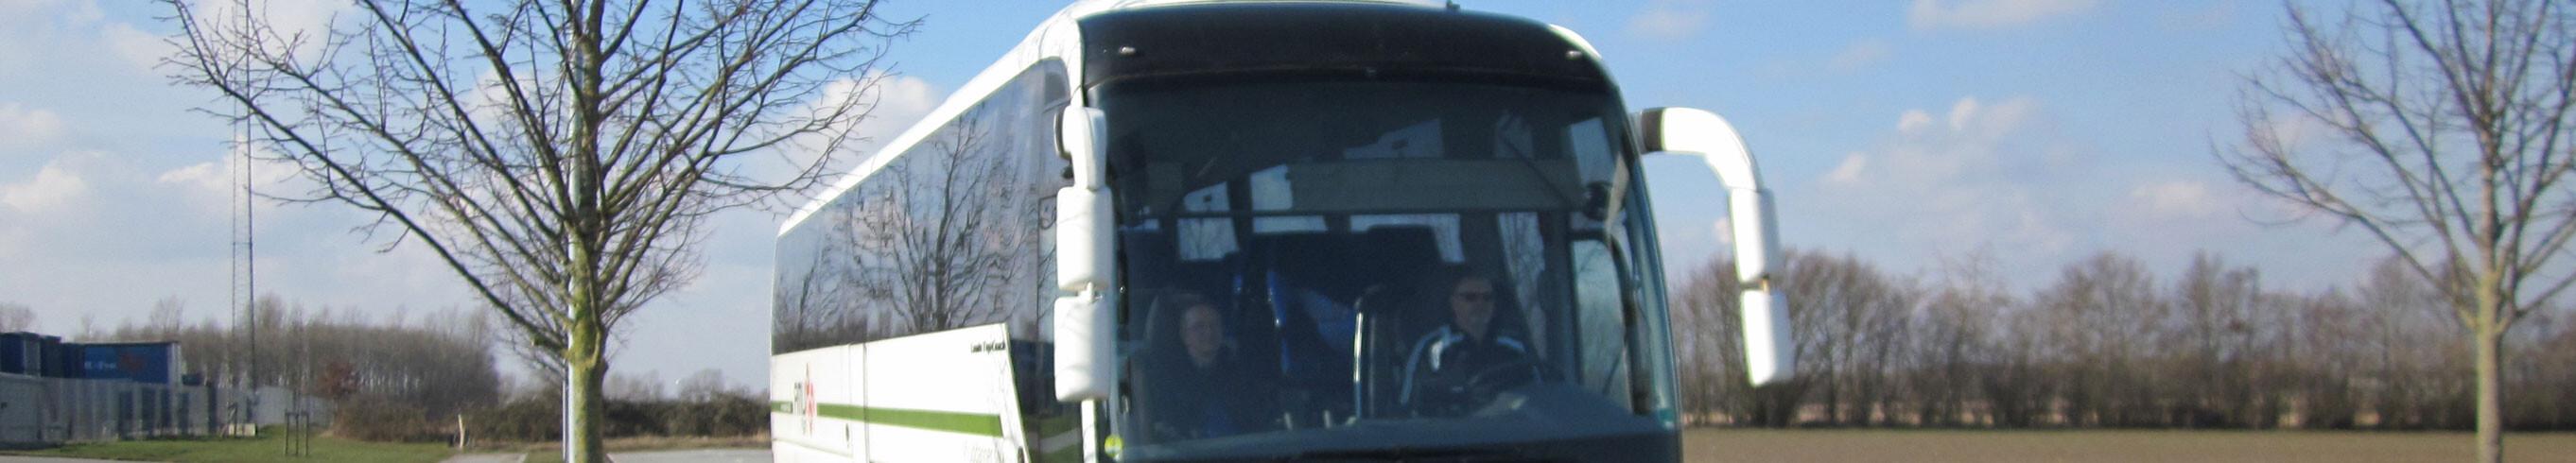 Meritvejen - for bus & lastbil